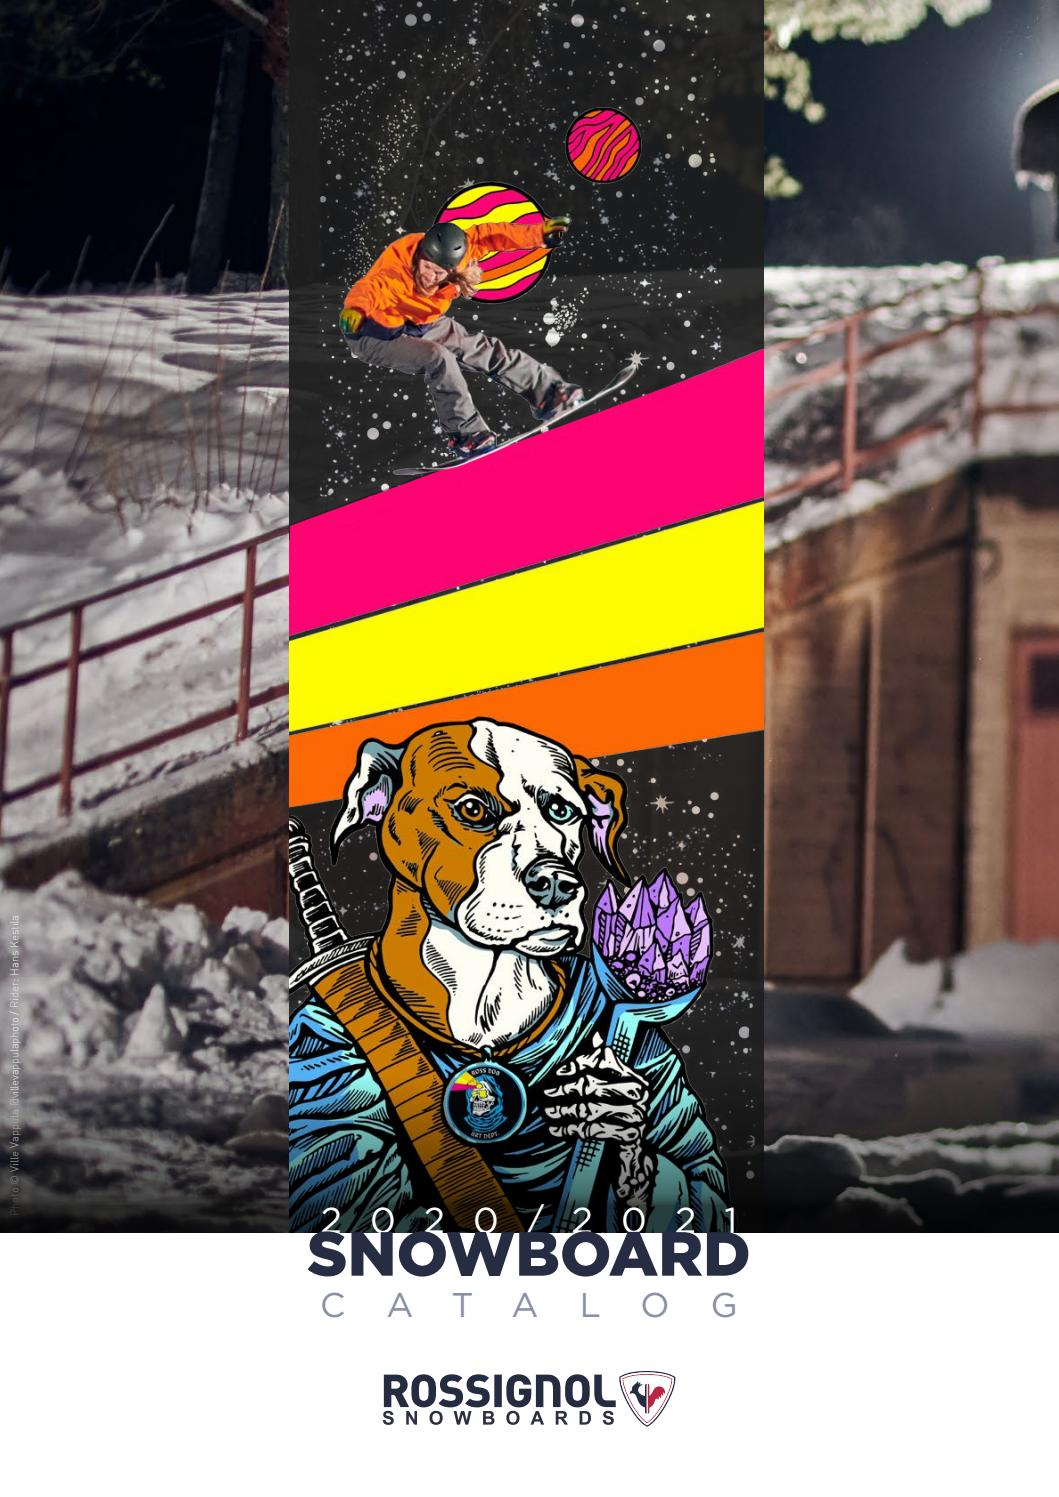 Rossignol District Amptek 161 WIDE Snowboard All Mountain Freestyle Board